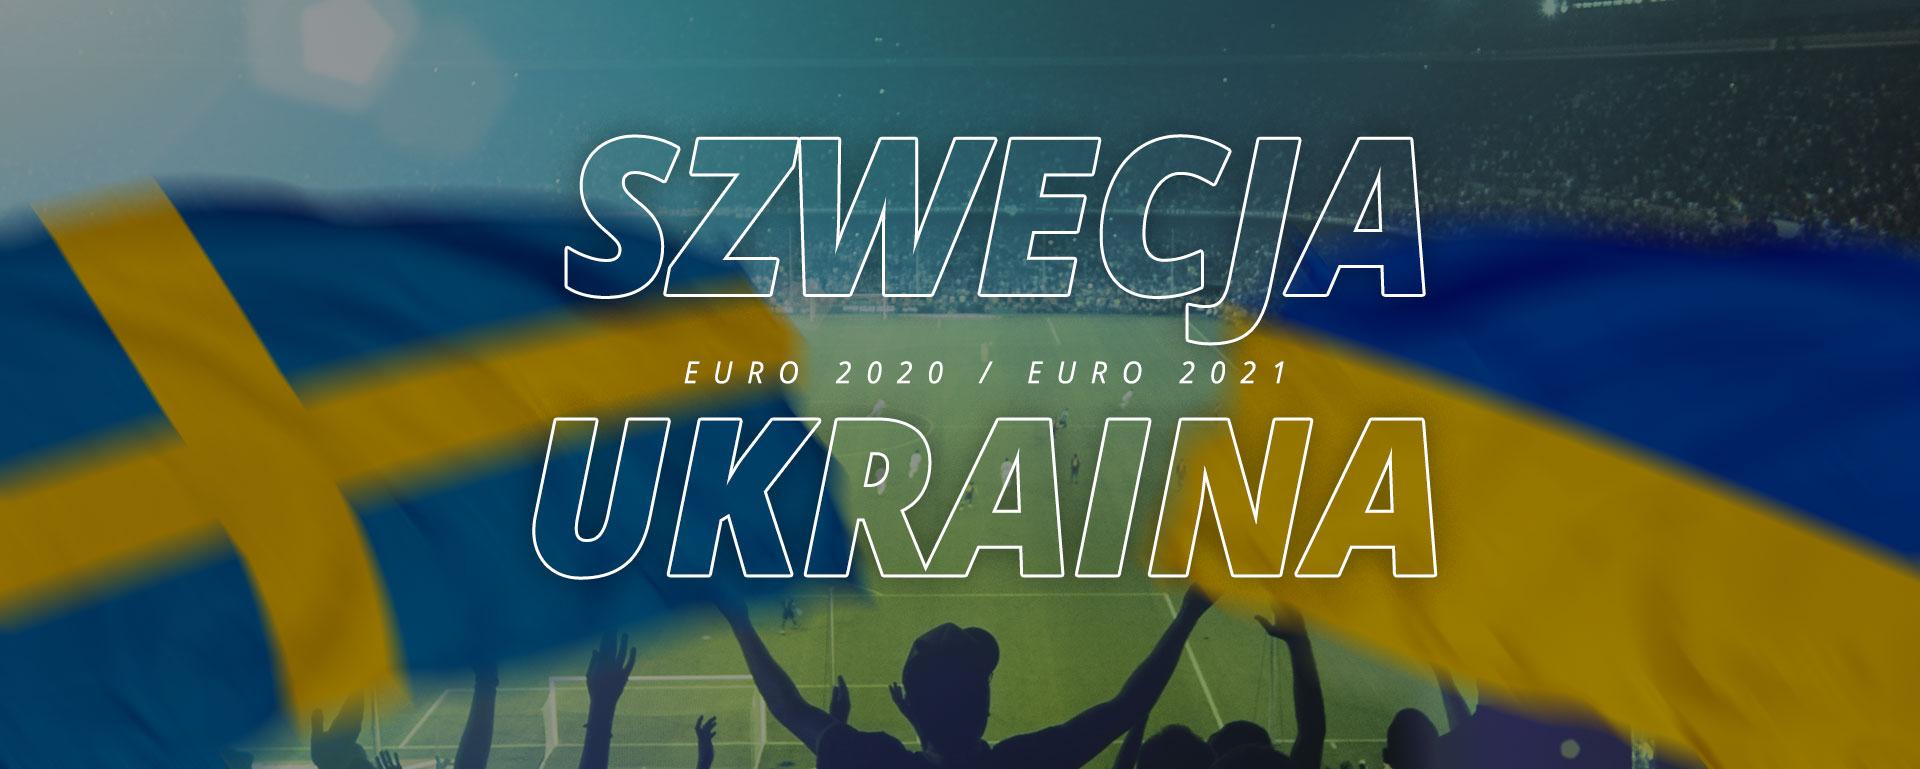 Szwecja – Ukraina | 1/8 finału Euro 2020 / Euro 2021